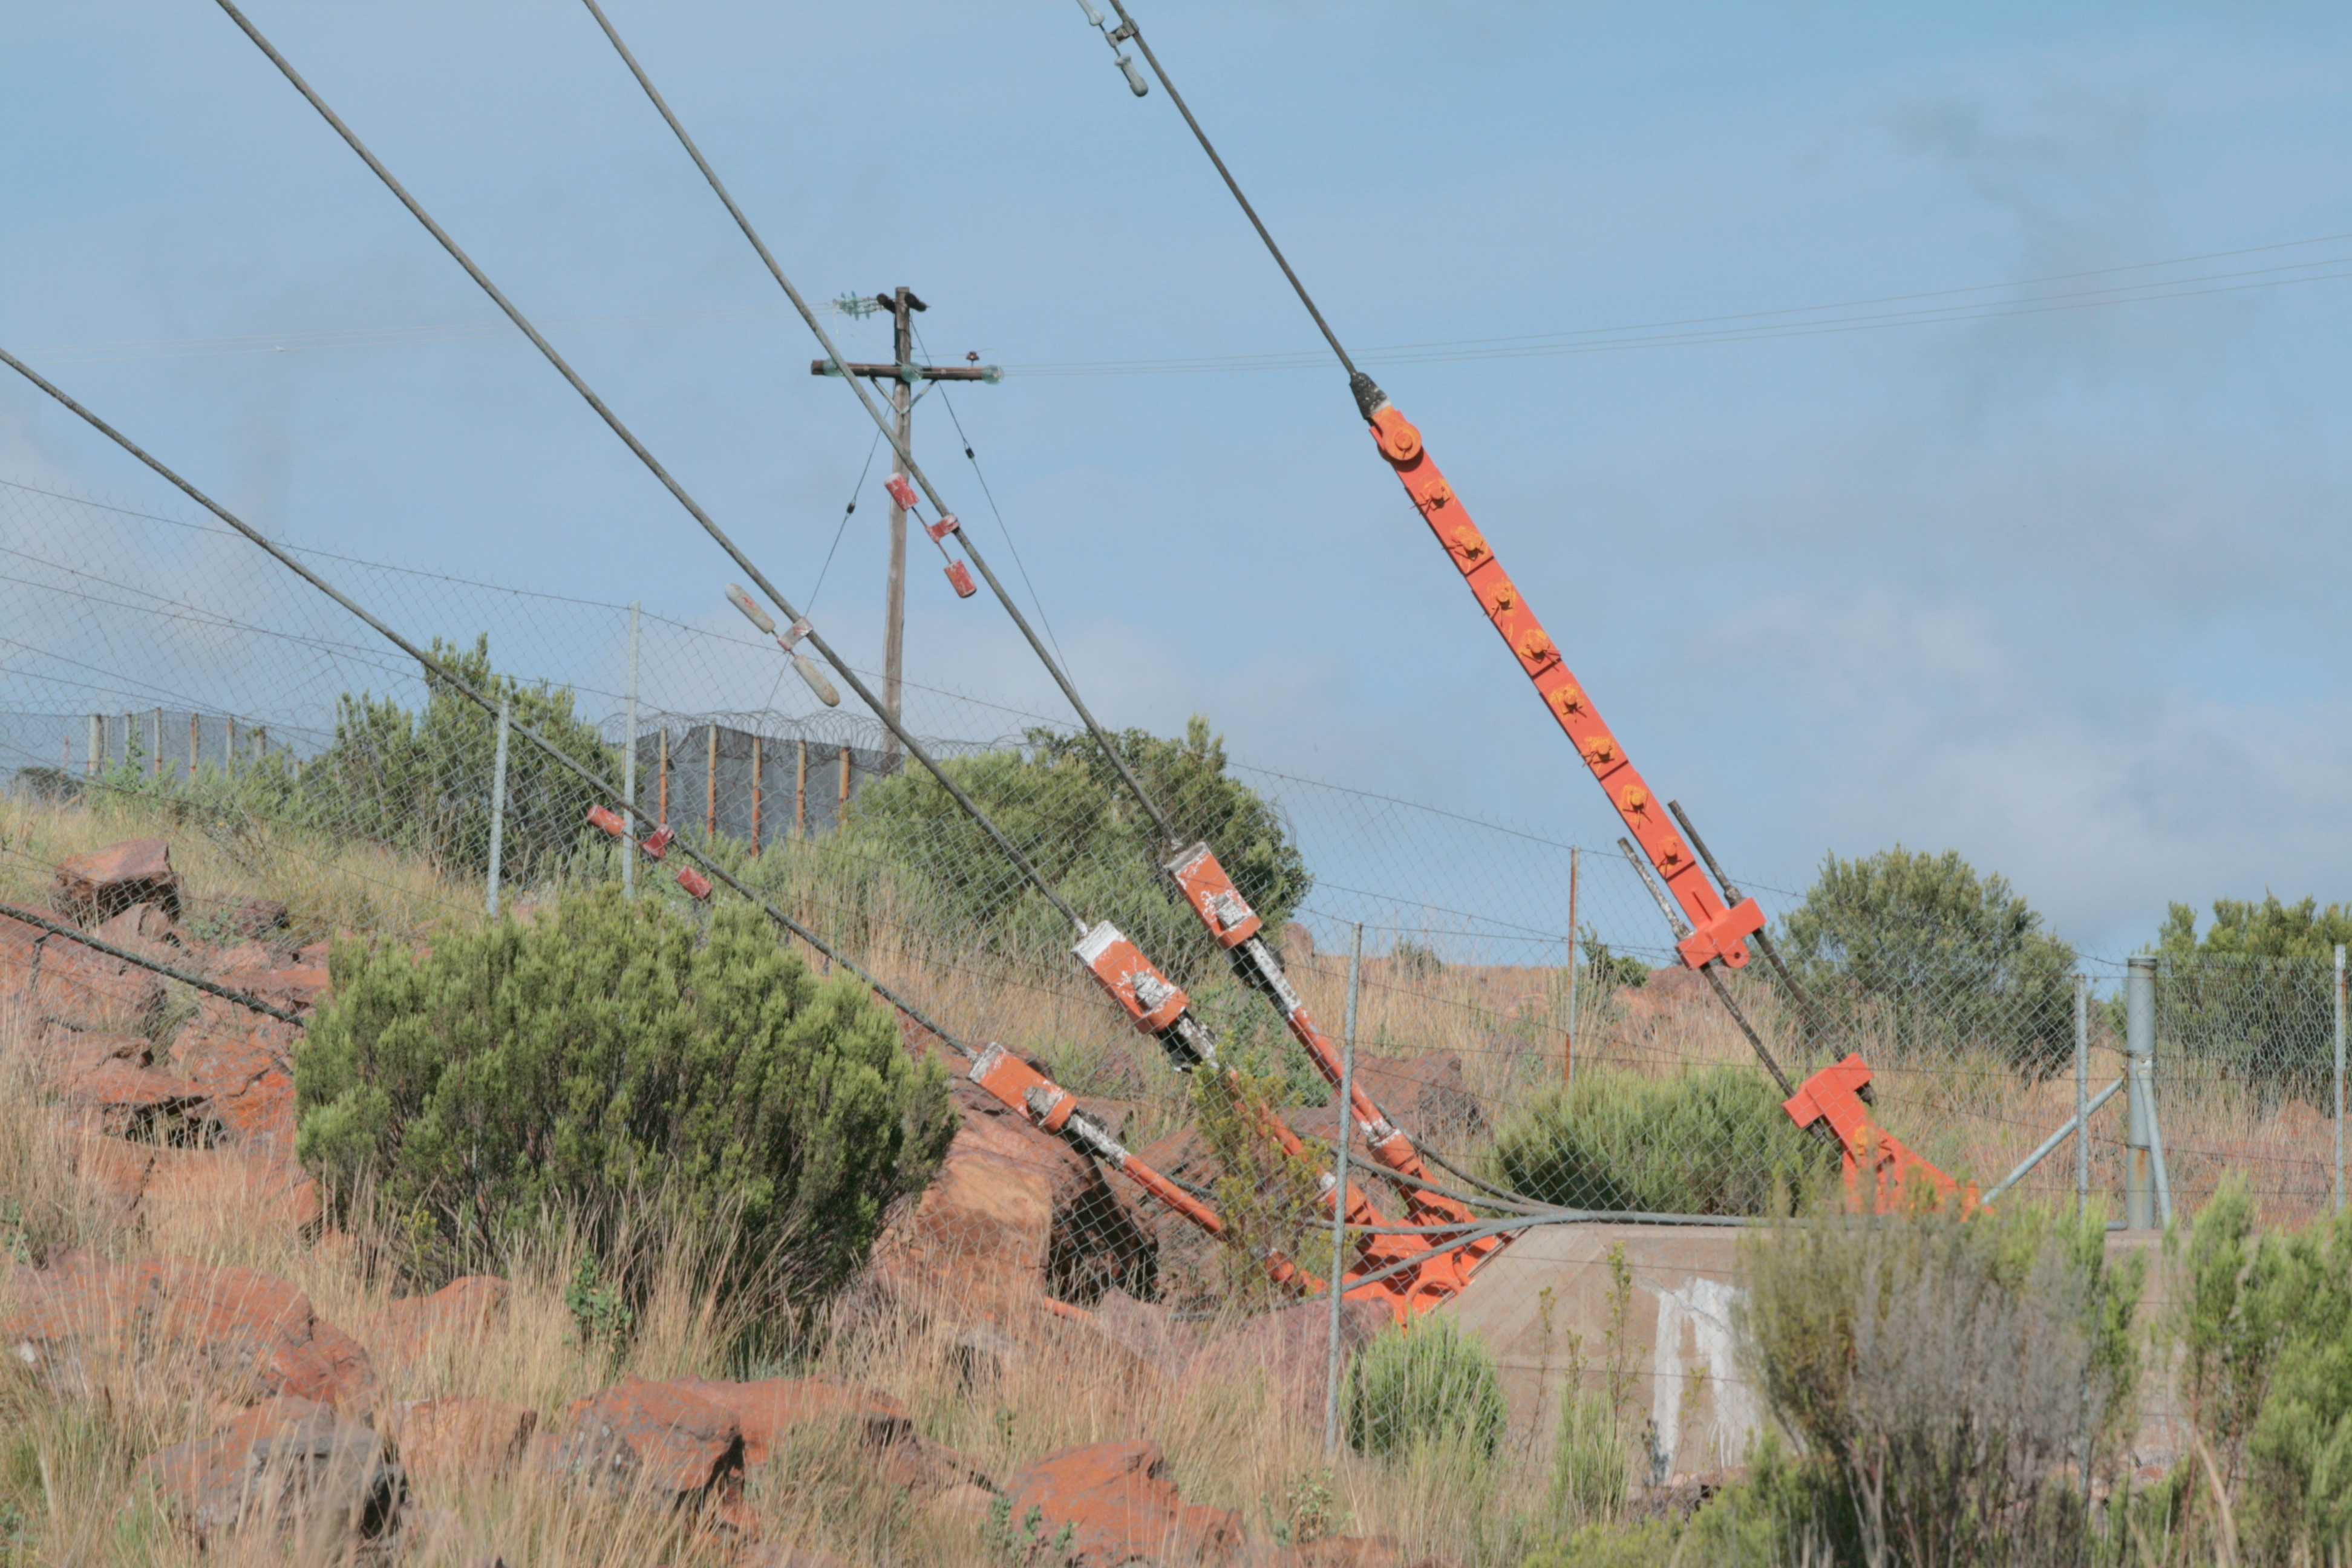 File:Thabazimbi tower - Guy wire earth anchor - 001.JPG - Wikimedia ...